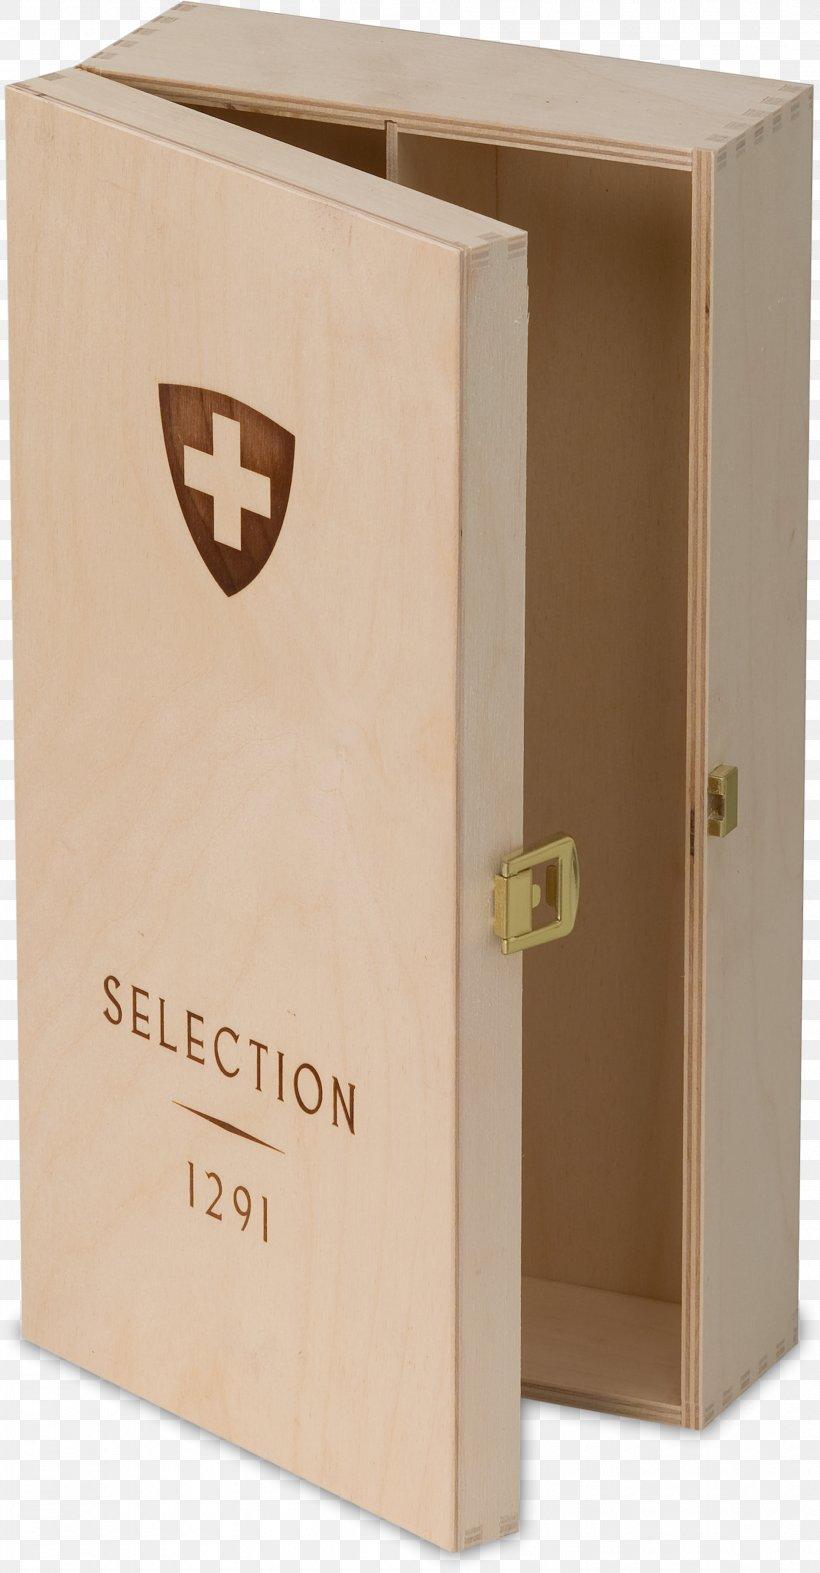 Box Wine Box Wine Crate Decorative Box, PNG, 1892x3630px, Box, Box Wine, Brand, Cardboard, Crate Download Free